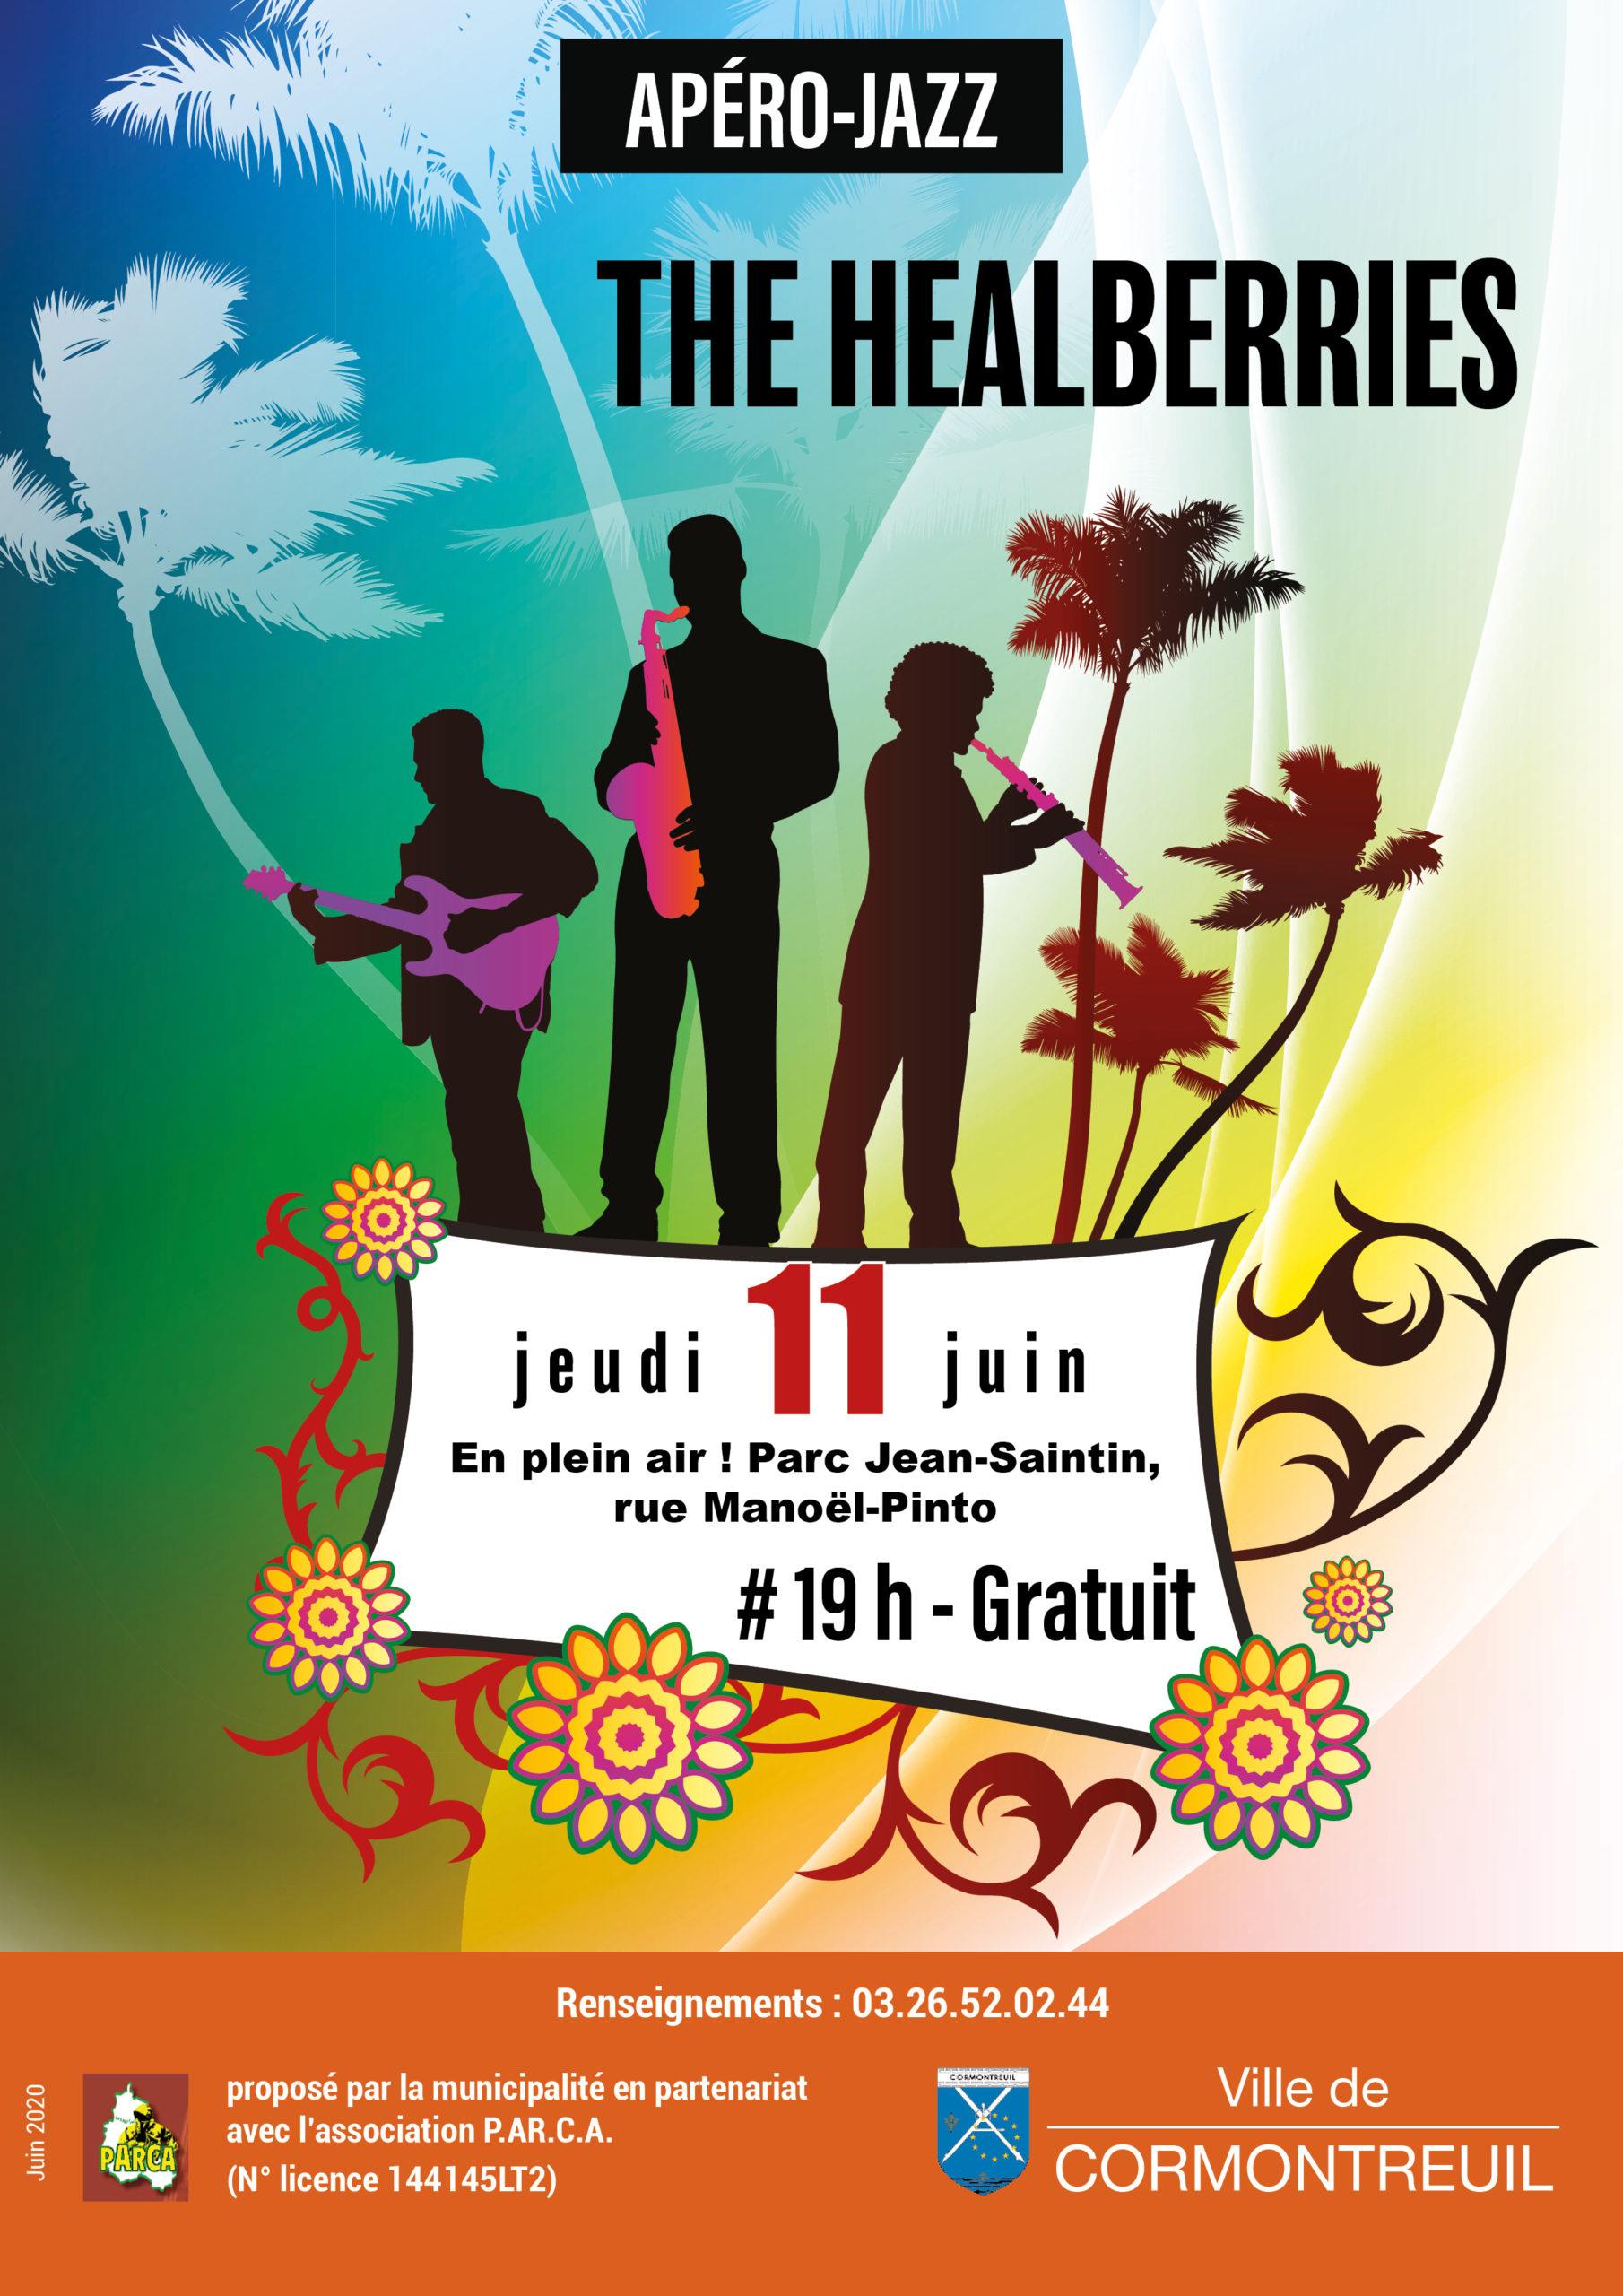 Cormontreuilaffiche apéro jazz The Healberries jeudi 11 juin 2020 parc Jean-Saintin 19h